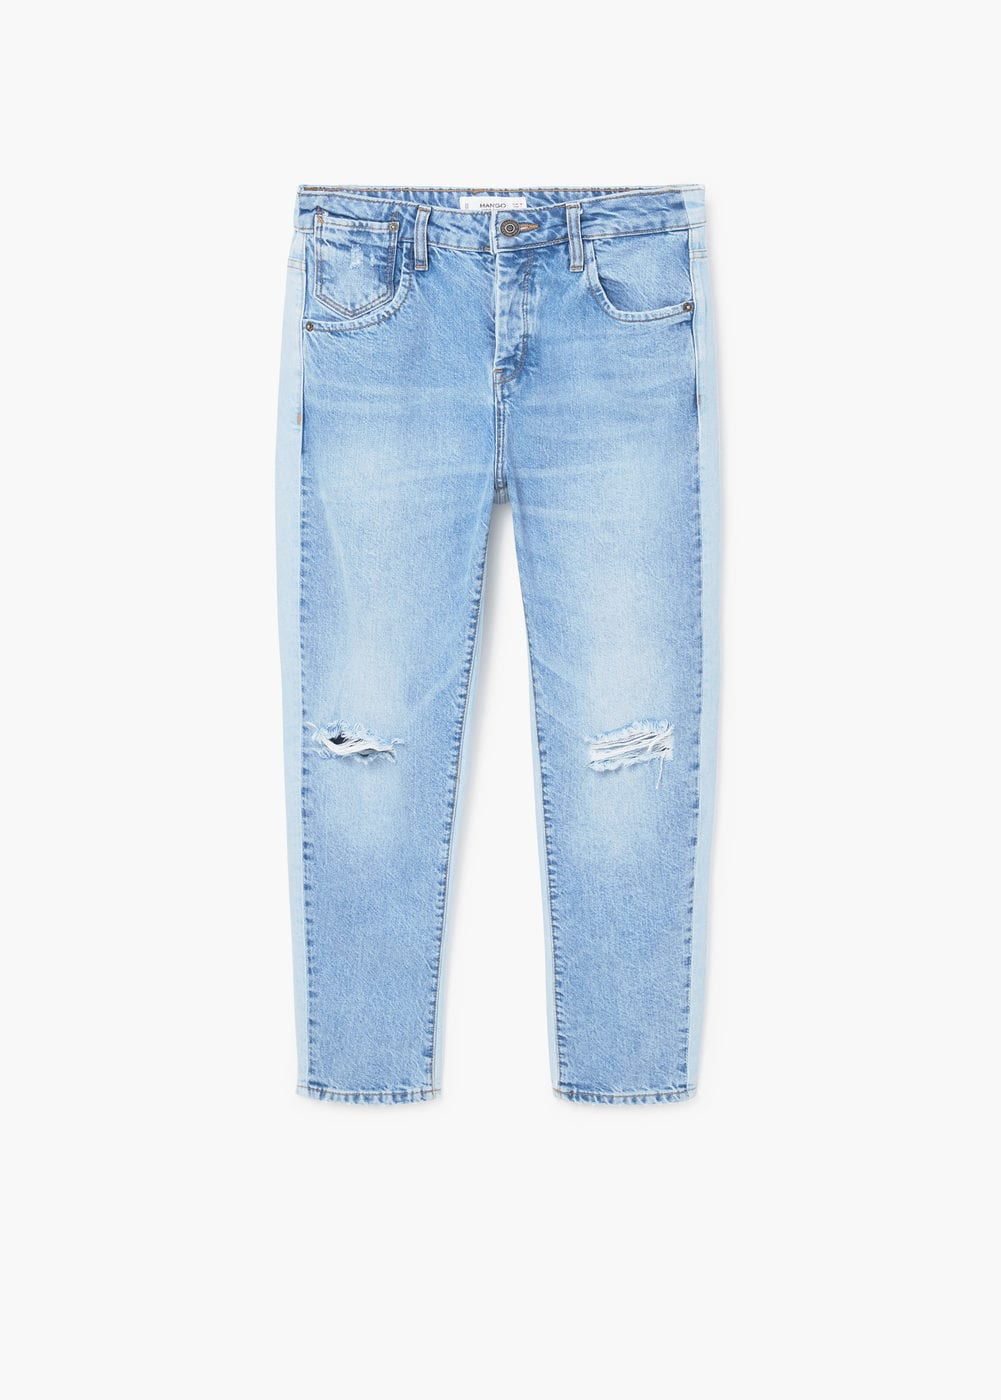 Mango boyfriend jeans $59.99